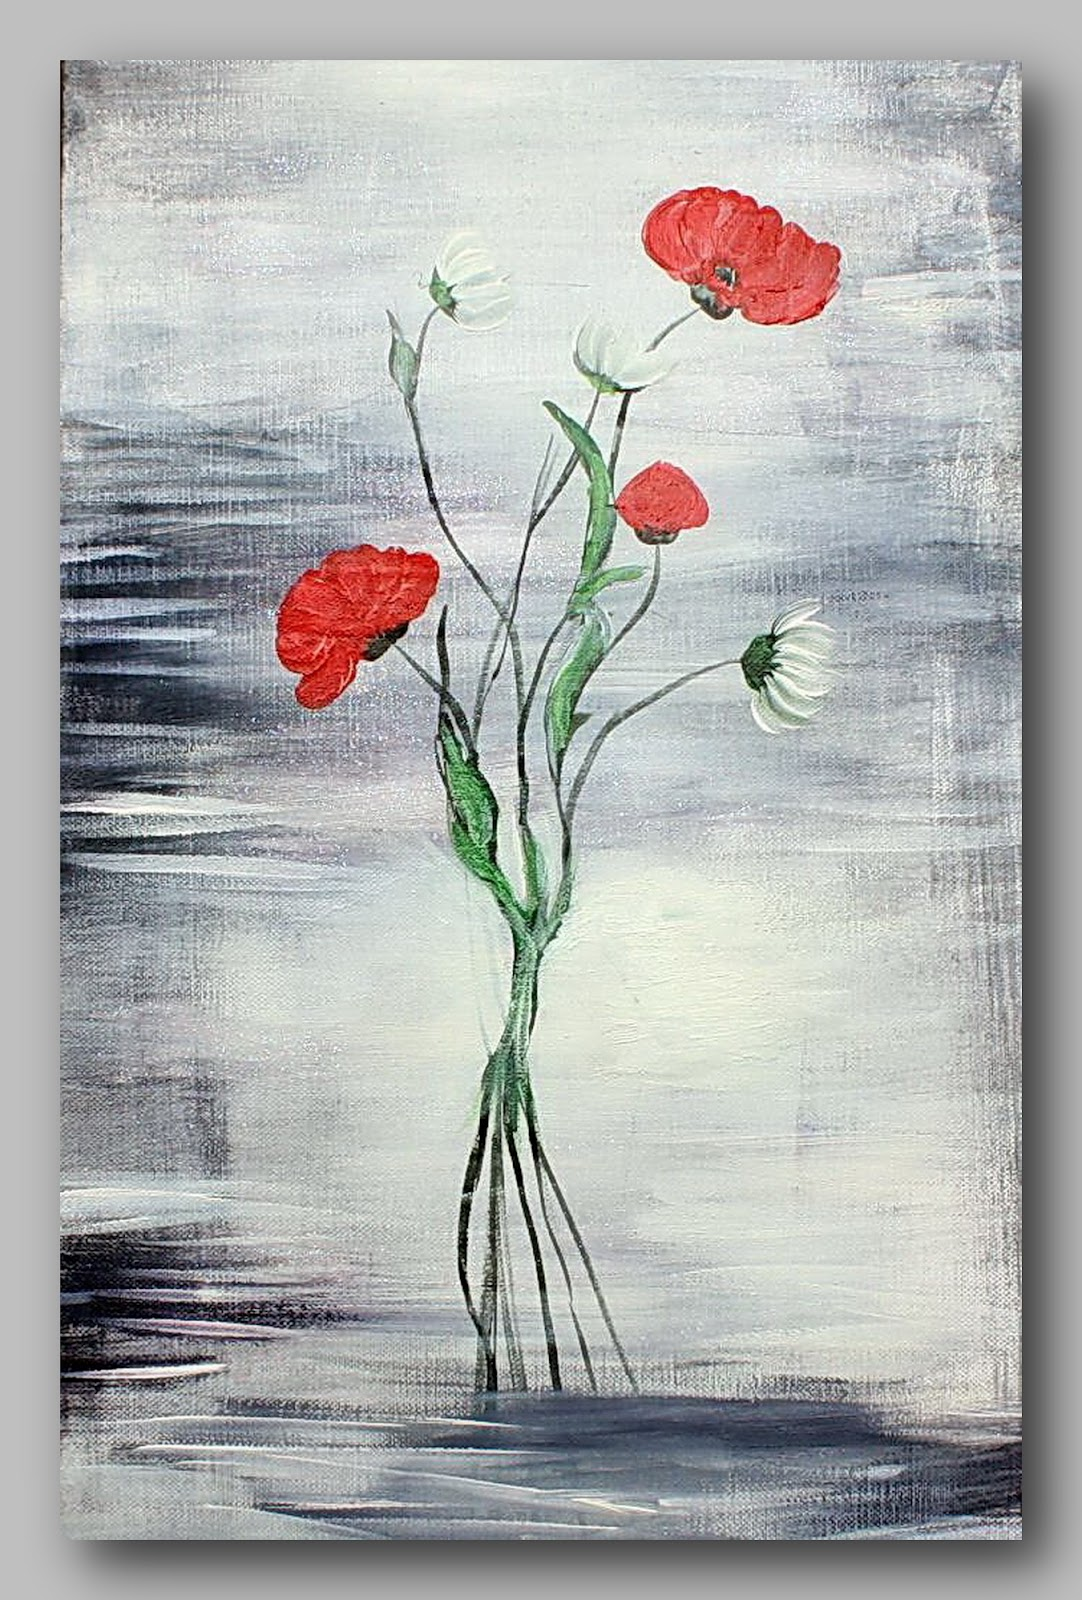 Kunstgewerbe und malerei m rz 2012 - Acrylmalerei ideen ...